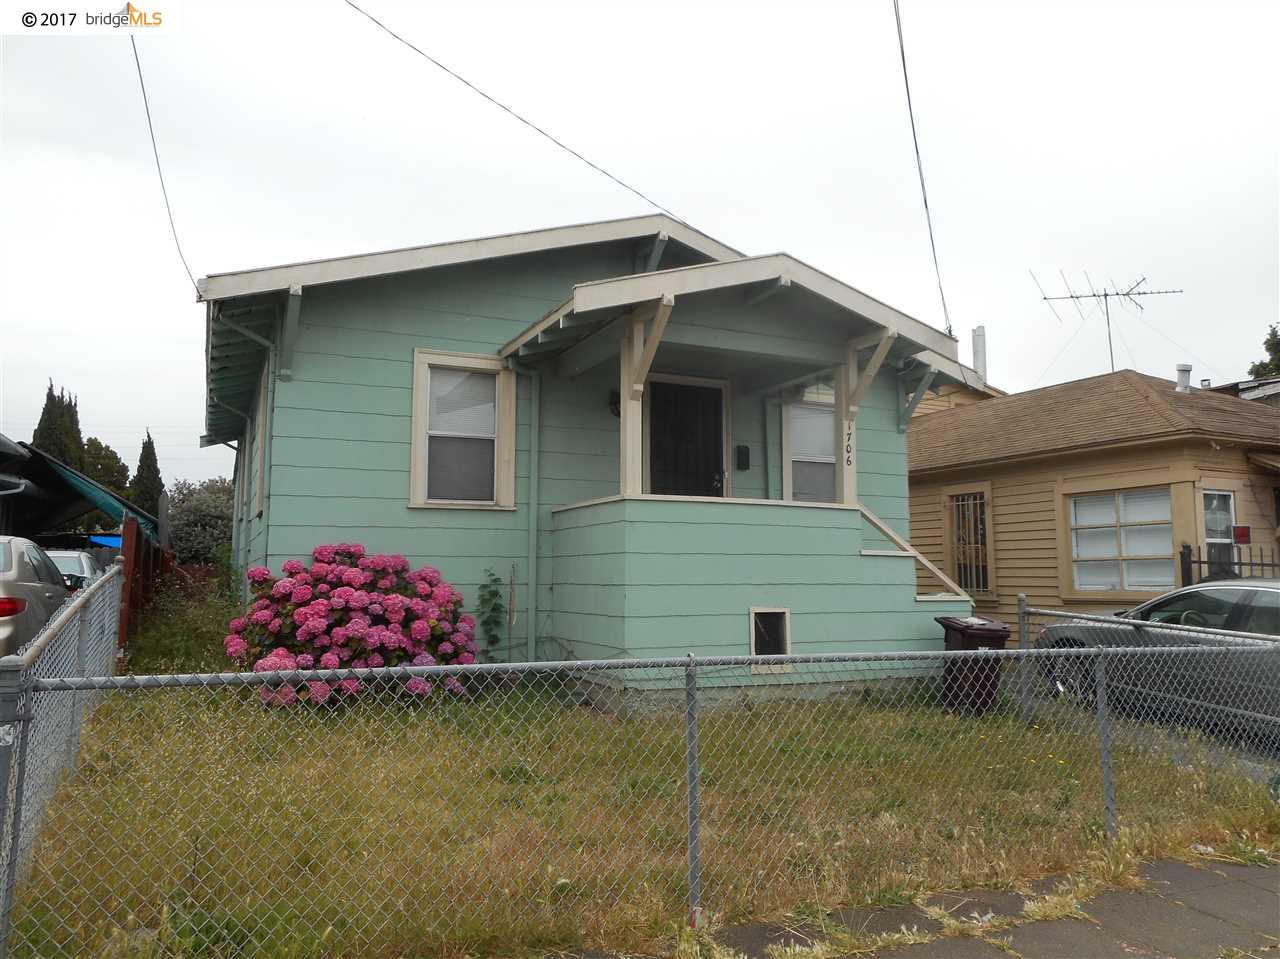 1706 69Th Ave, OAKLAND, CA 94621